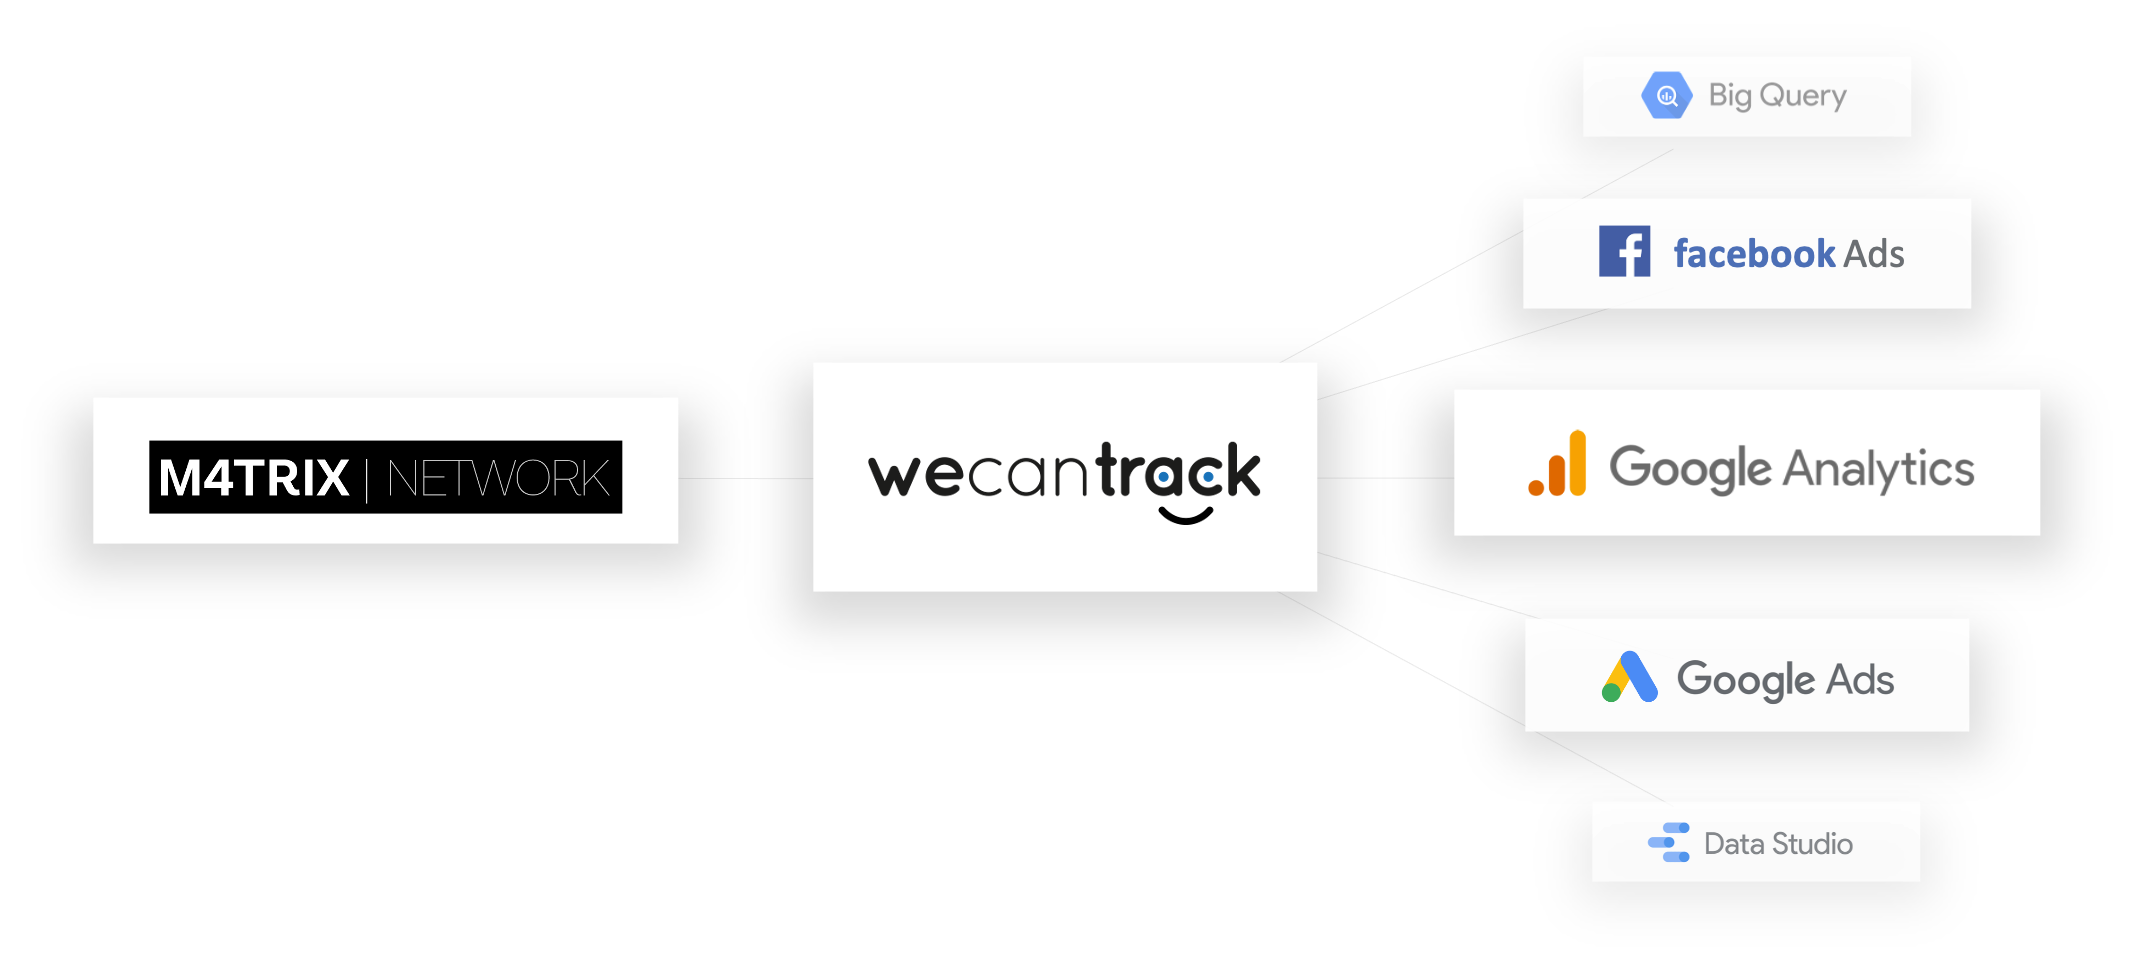 m4trix-affiliate-conversion-integration-via-postback-url